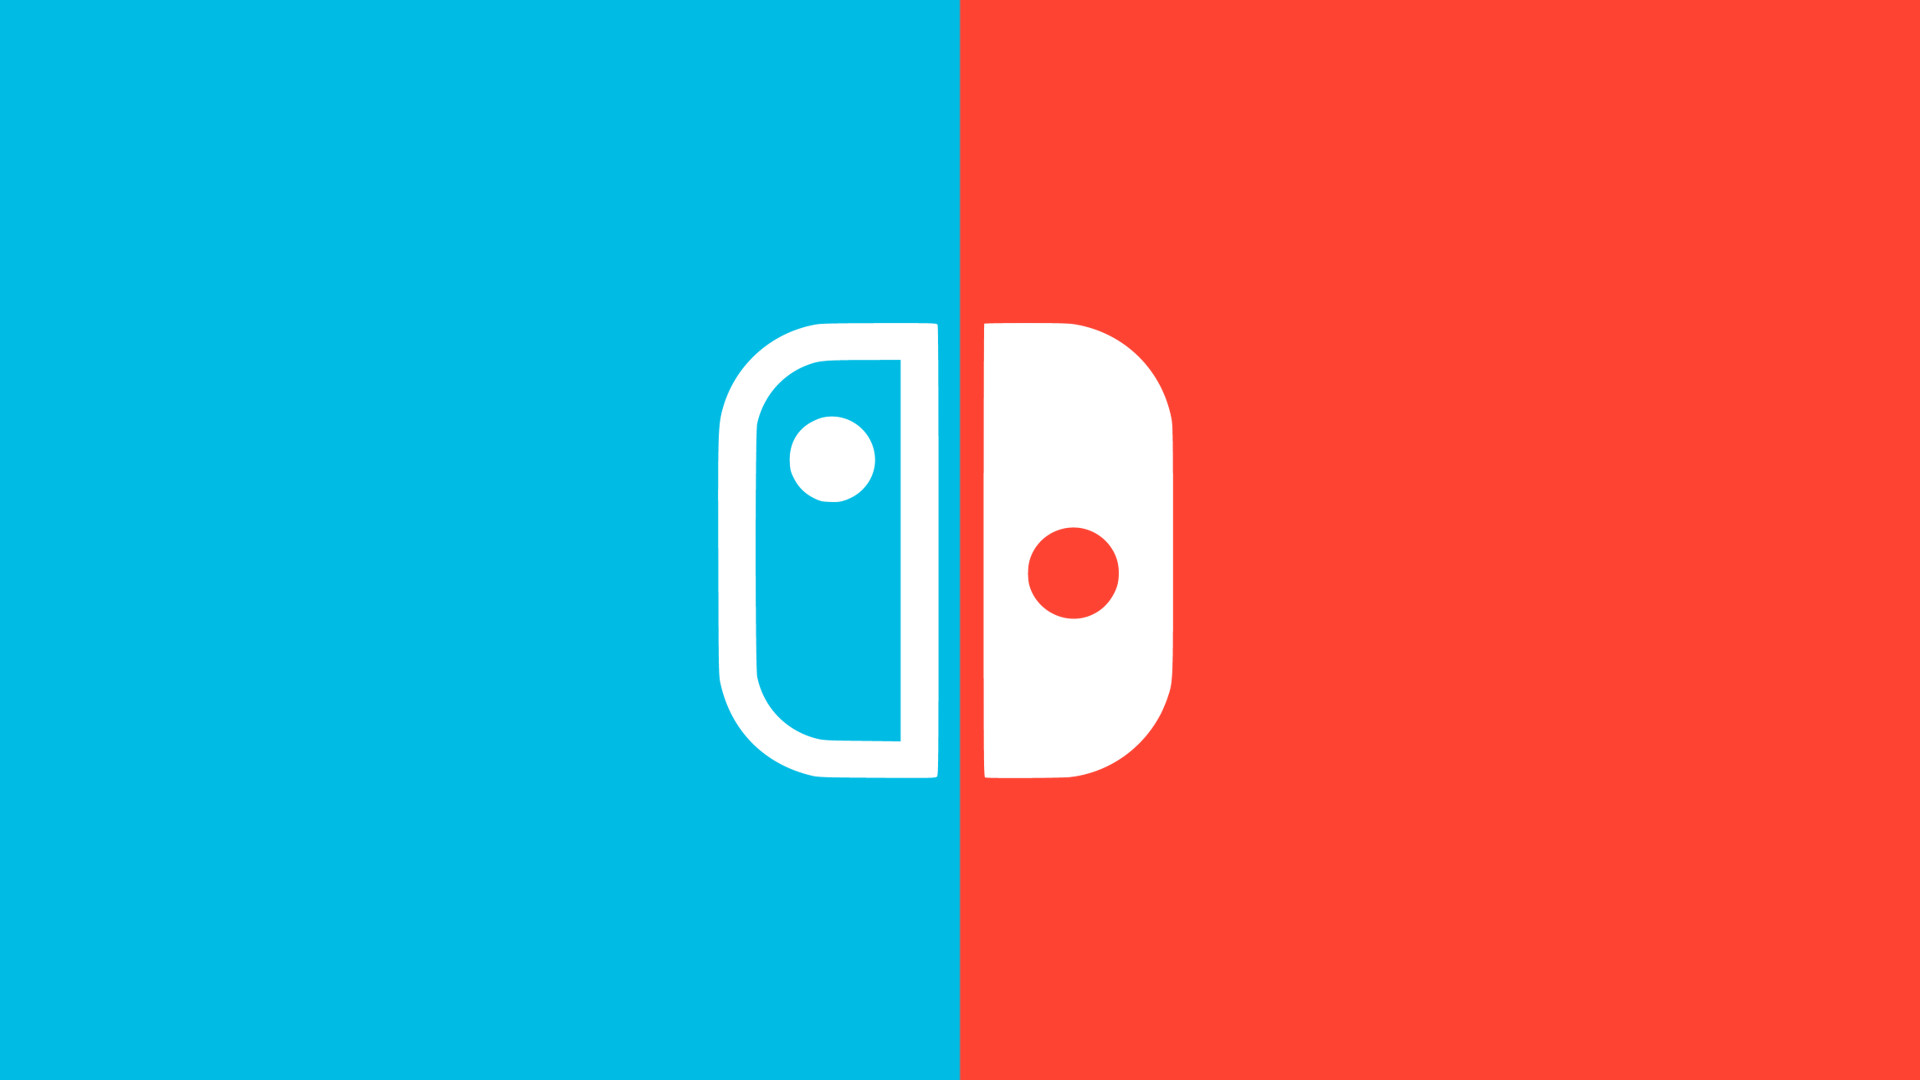 Nintendo wallpaper 77 images 1920x1080 nintendo switch logo wallpaper 60383 voltagebd Choice Image